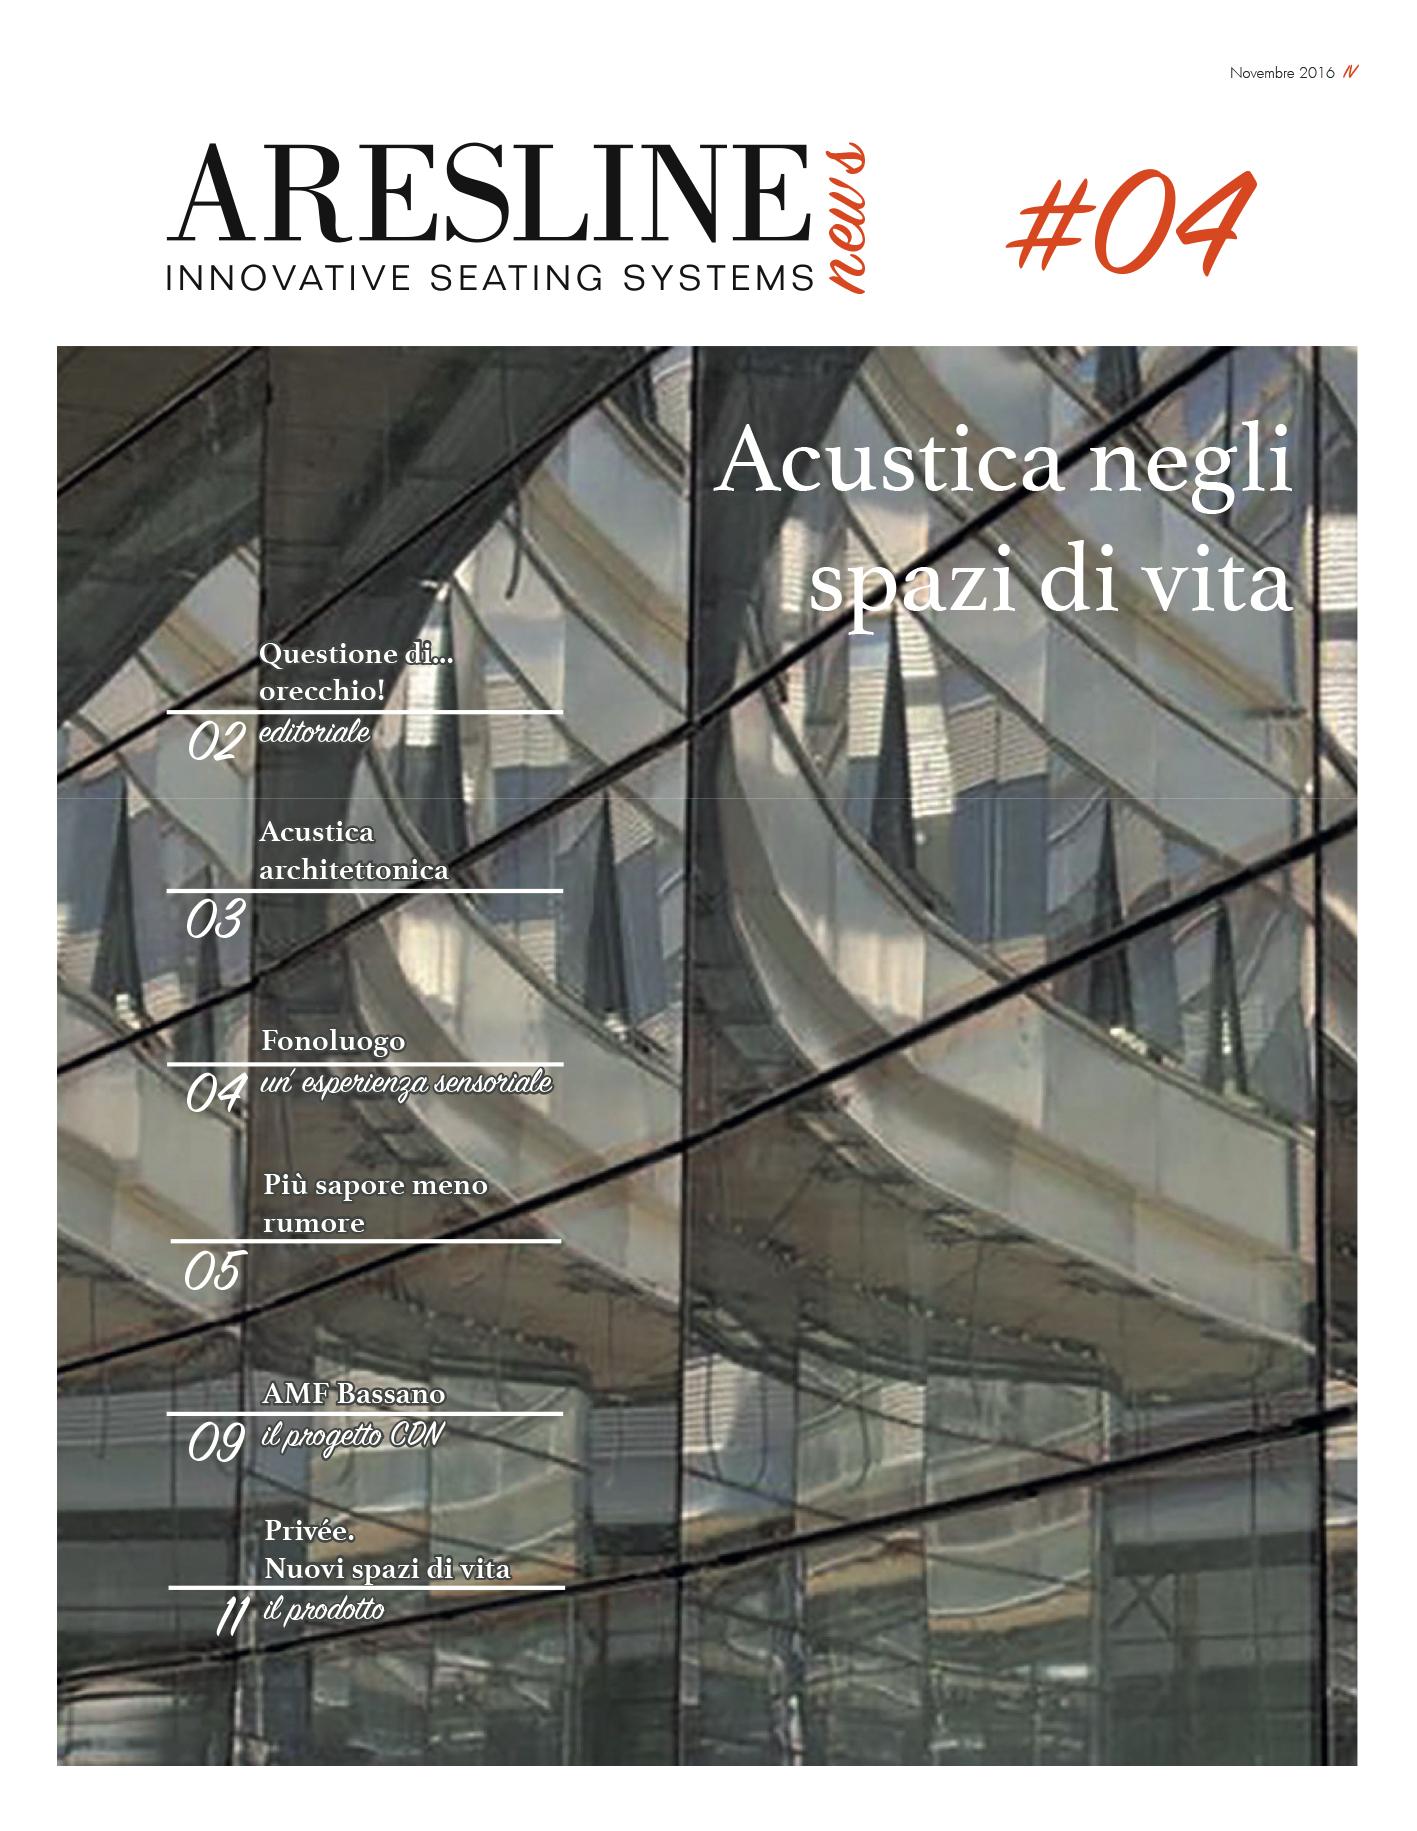 NEWS | ARES LINE NEWS #04